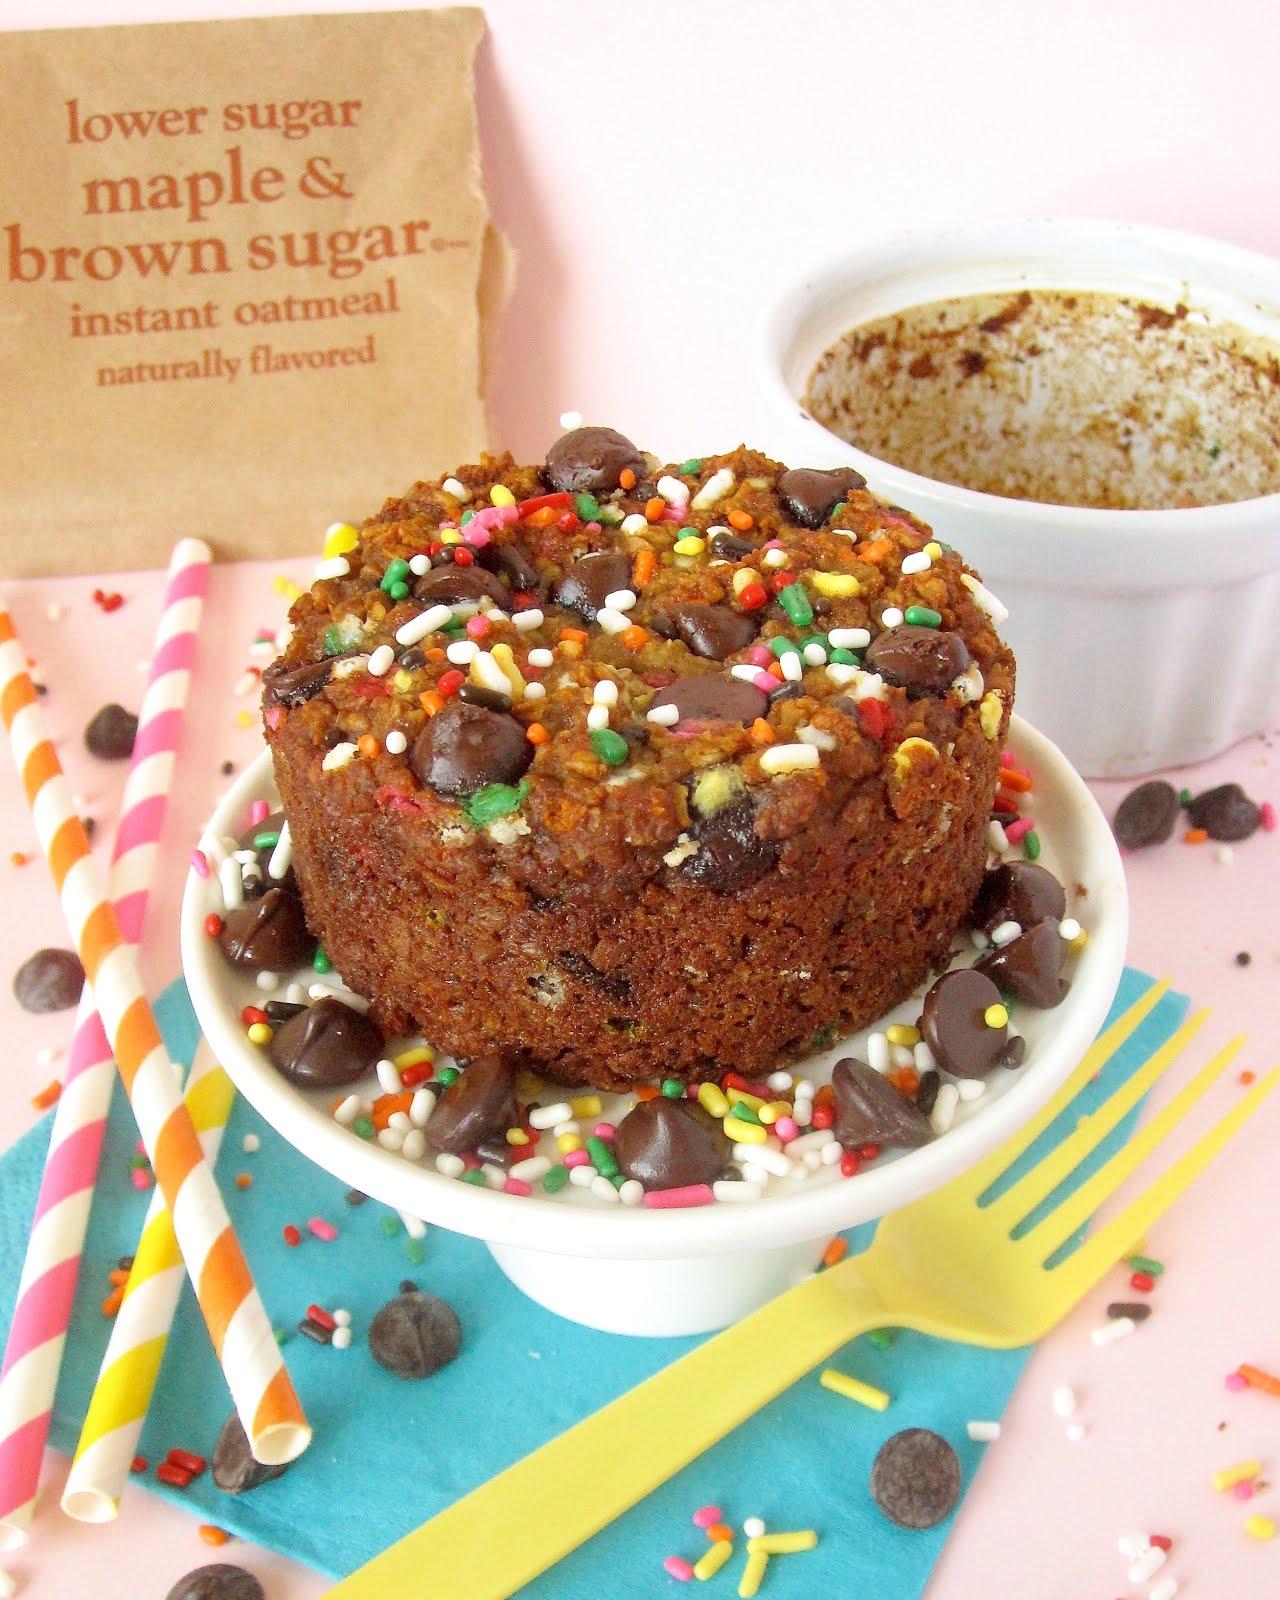 Single Serving Skinny Birthday Cake Baked Oatmeal Egg Free Dairy